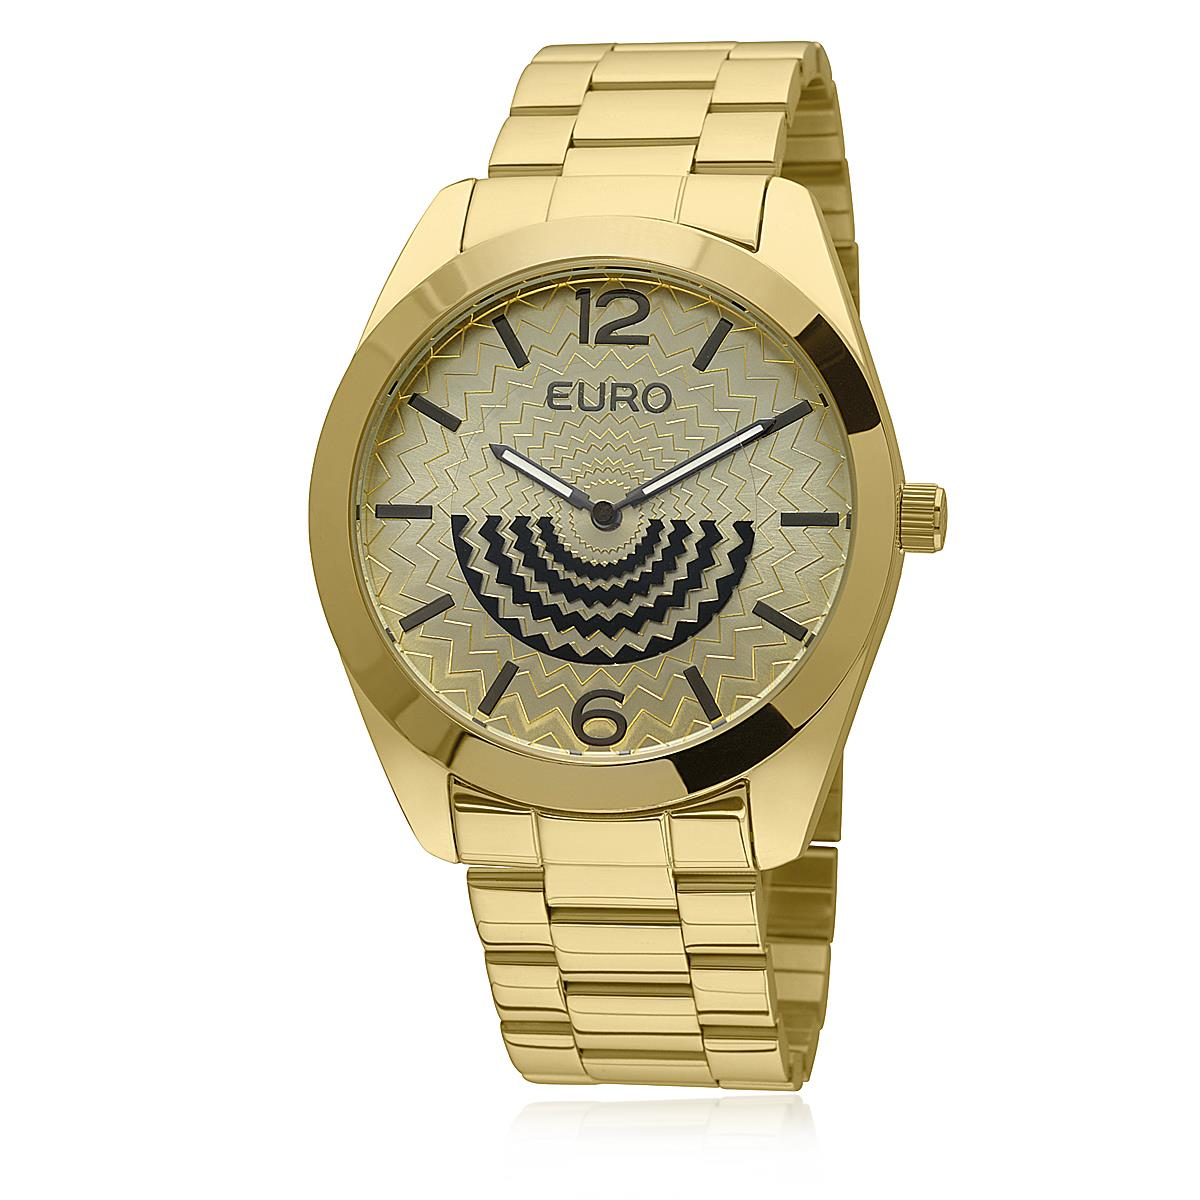 e94b91d74df Relógio Feminino Euro Fan Analógico EU2034AN 4D Dourado